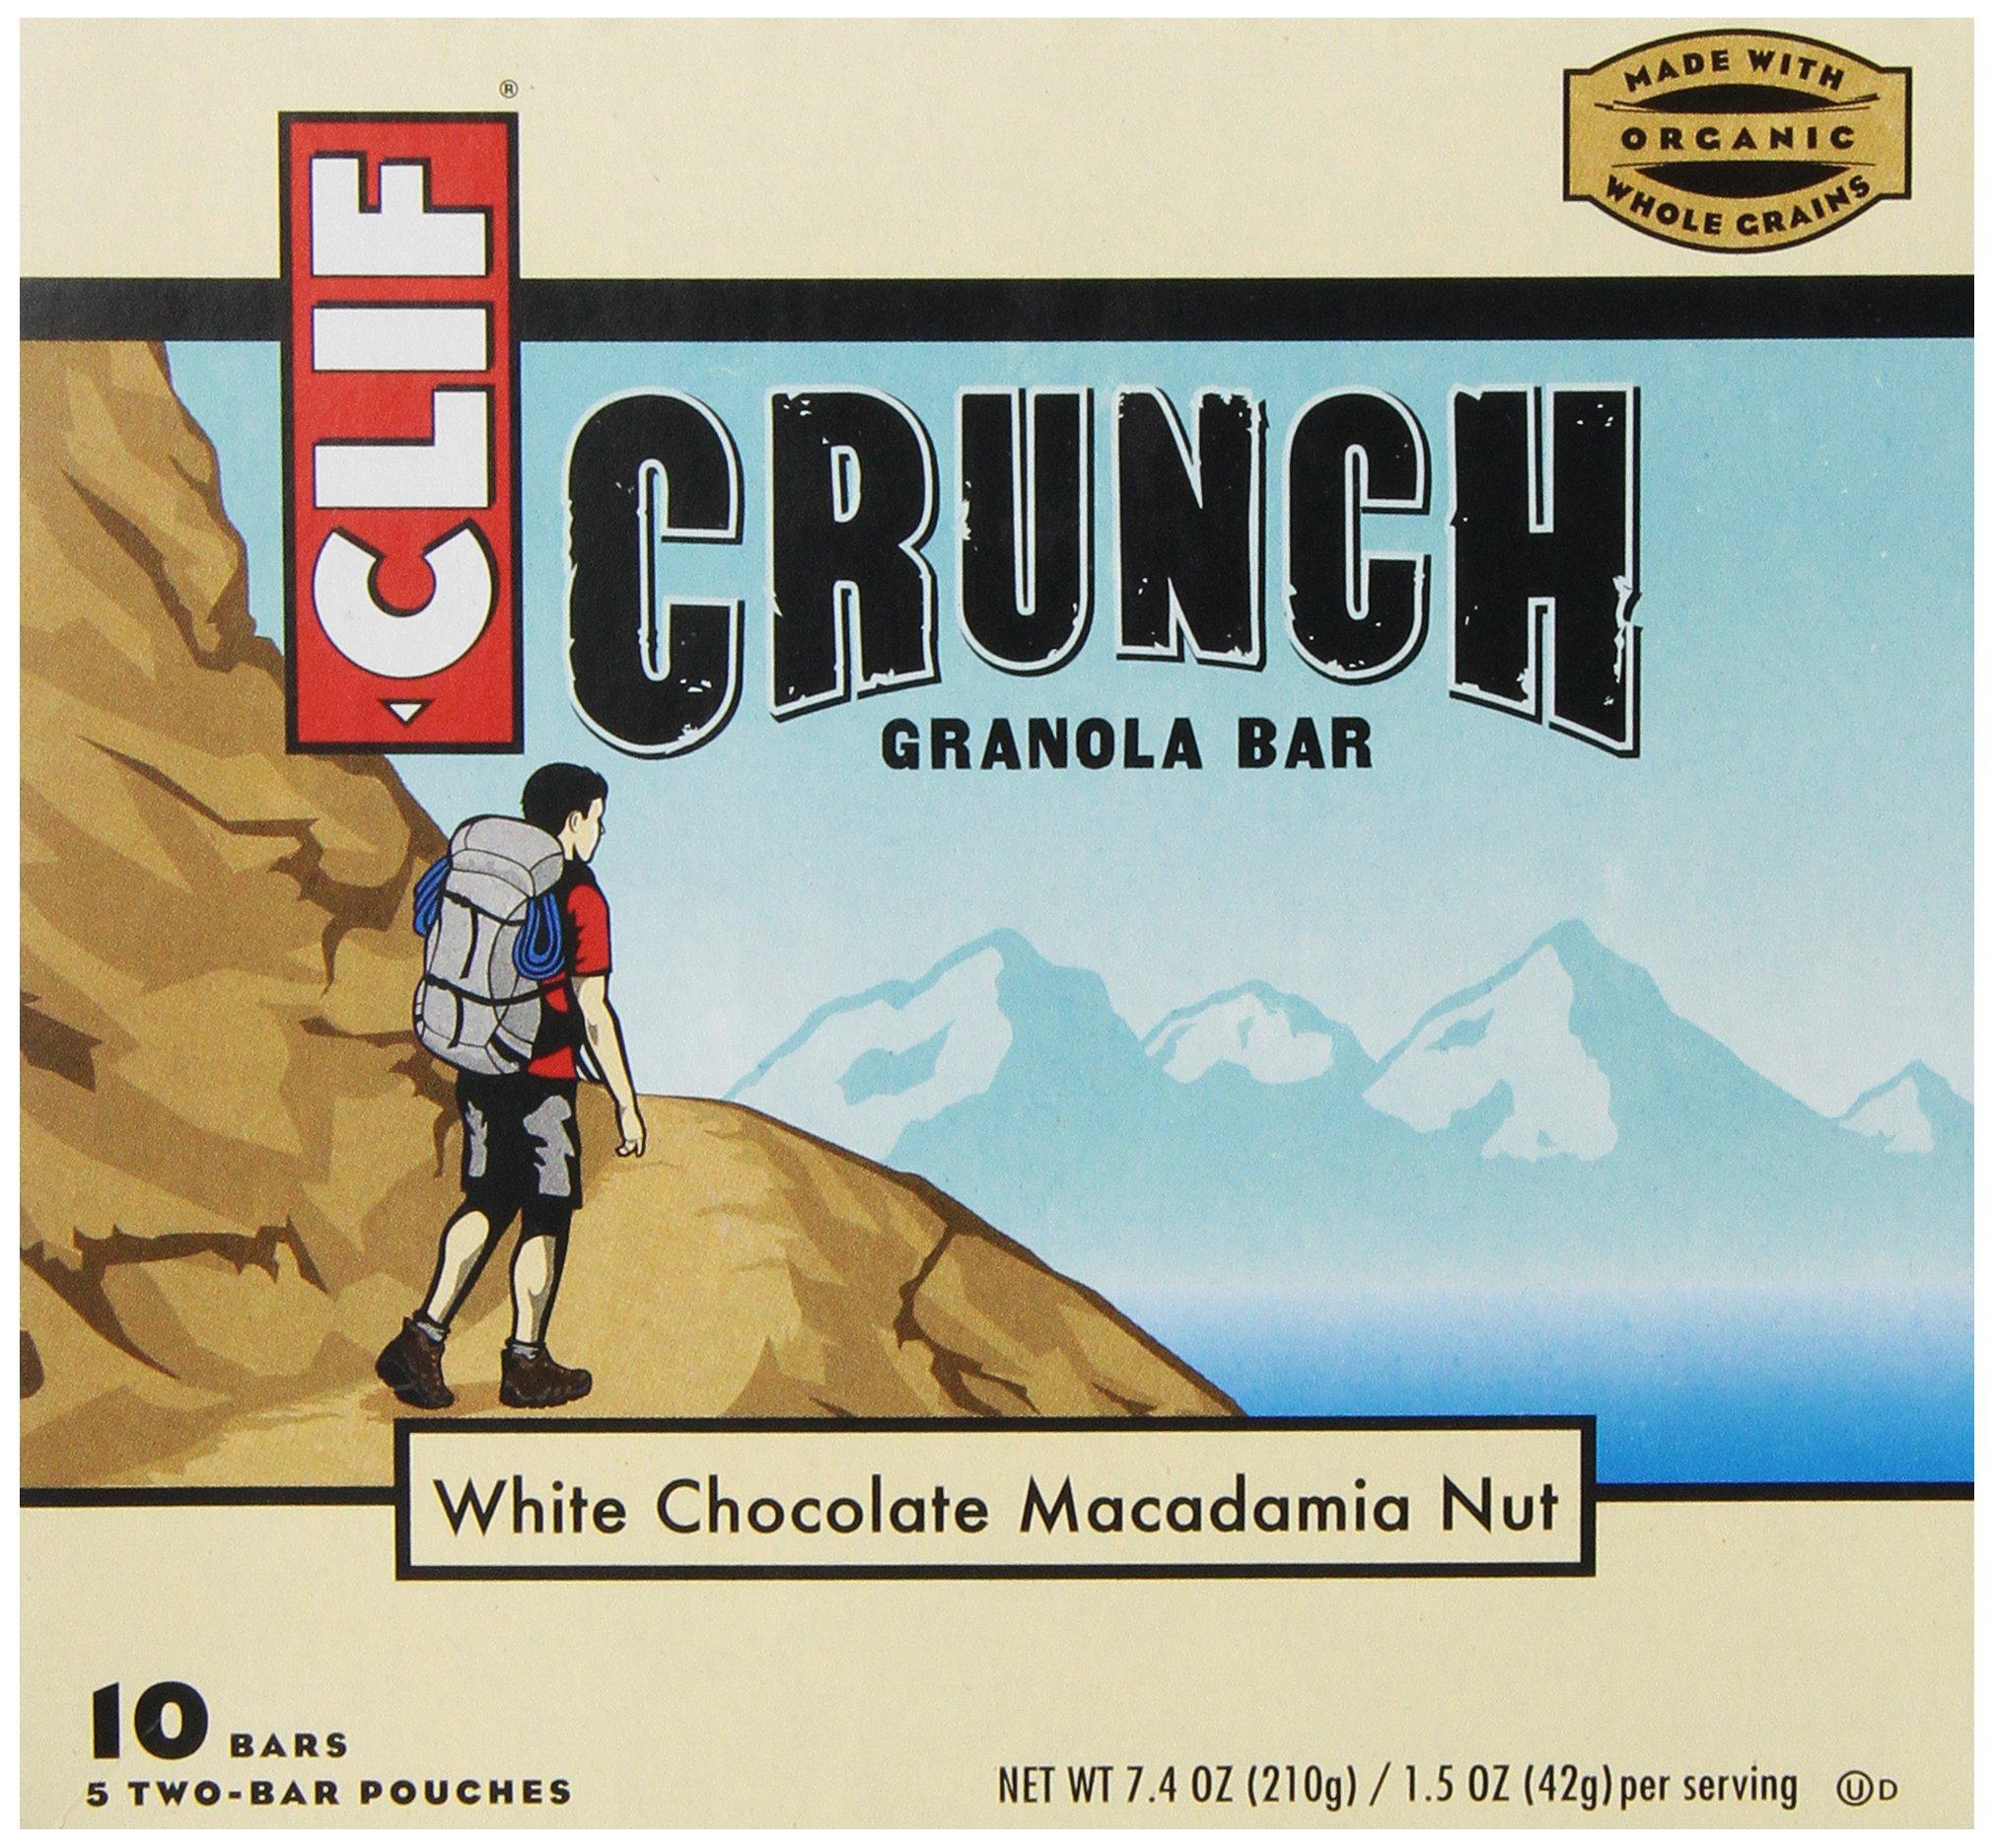 CLIF CRUNCH- Granola Bar - White Chocolate Macadamia - (1.48 Ounce, 5 Two-Bar Snack Pouches)